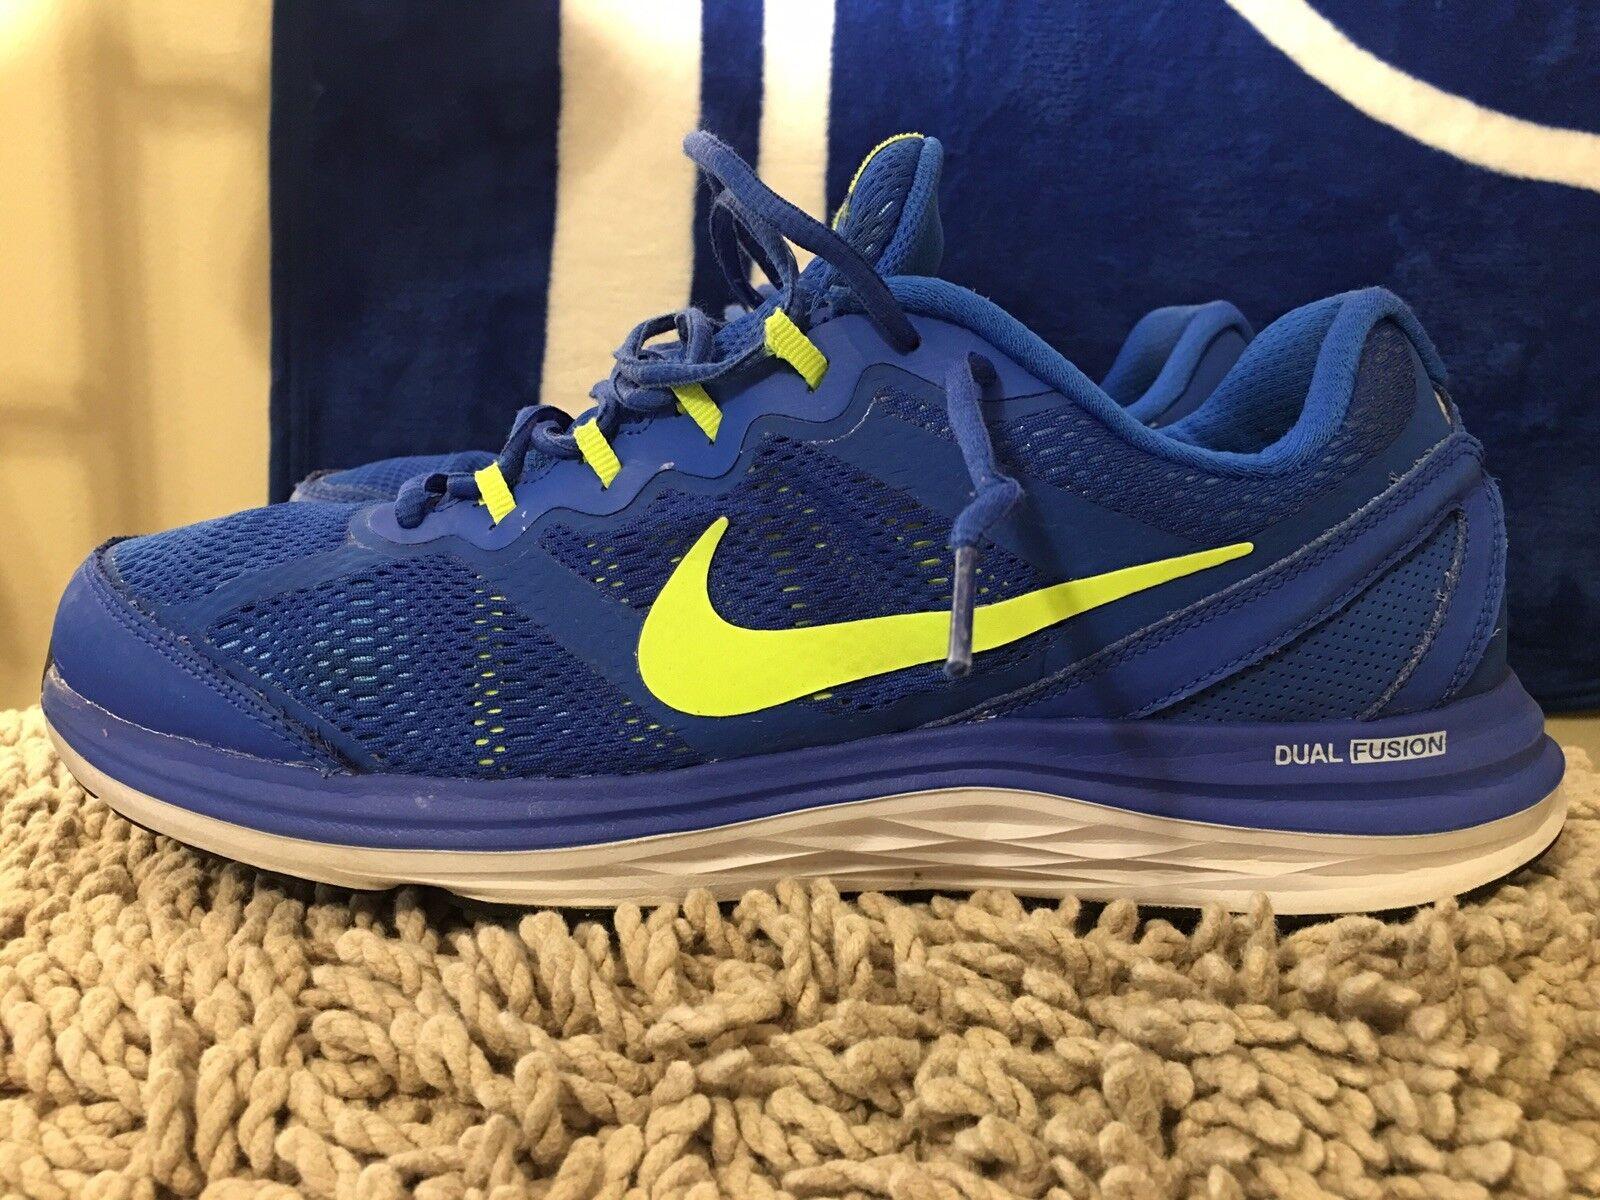 NIKE DUAL FUSION RUN 3, 653596-400, Hyper Cobalt, Men's Running shoes, Size 11.5